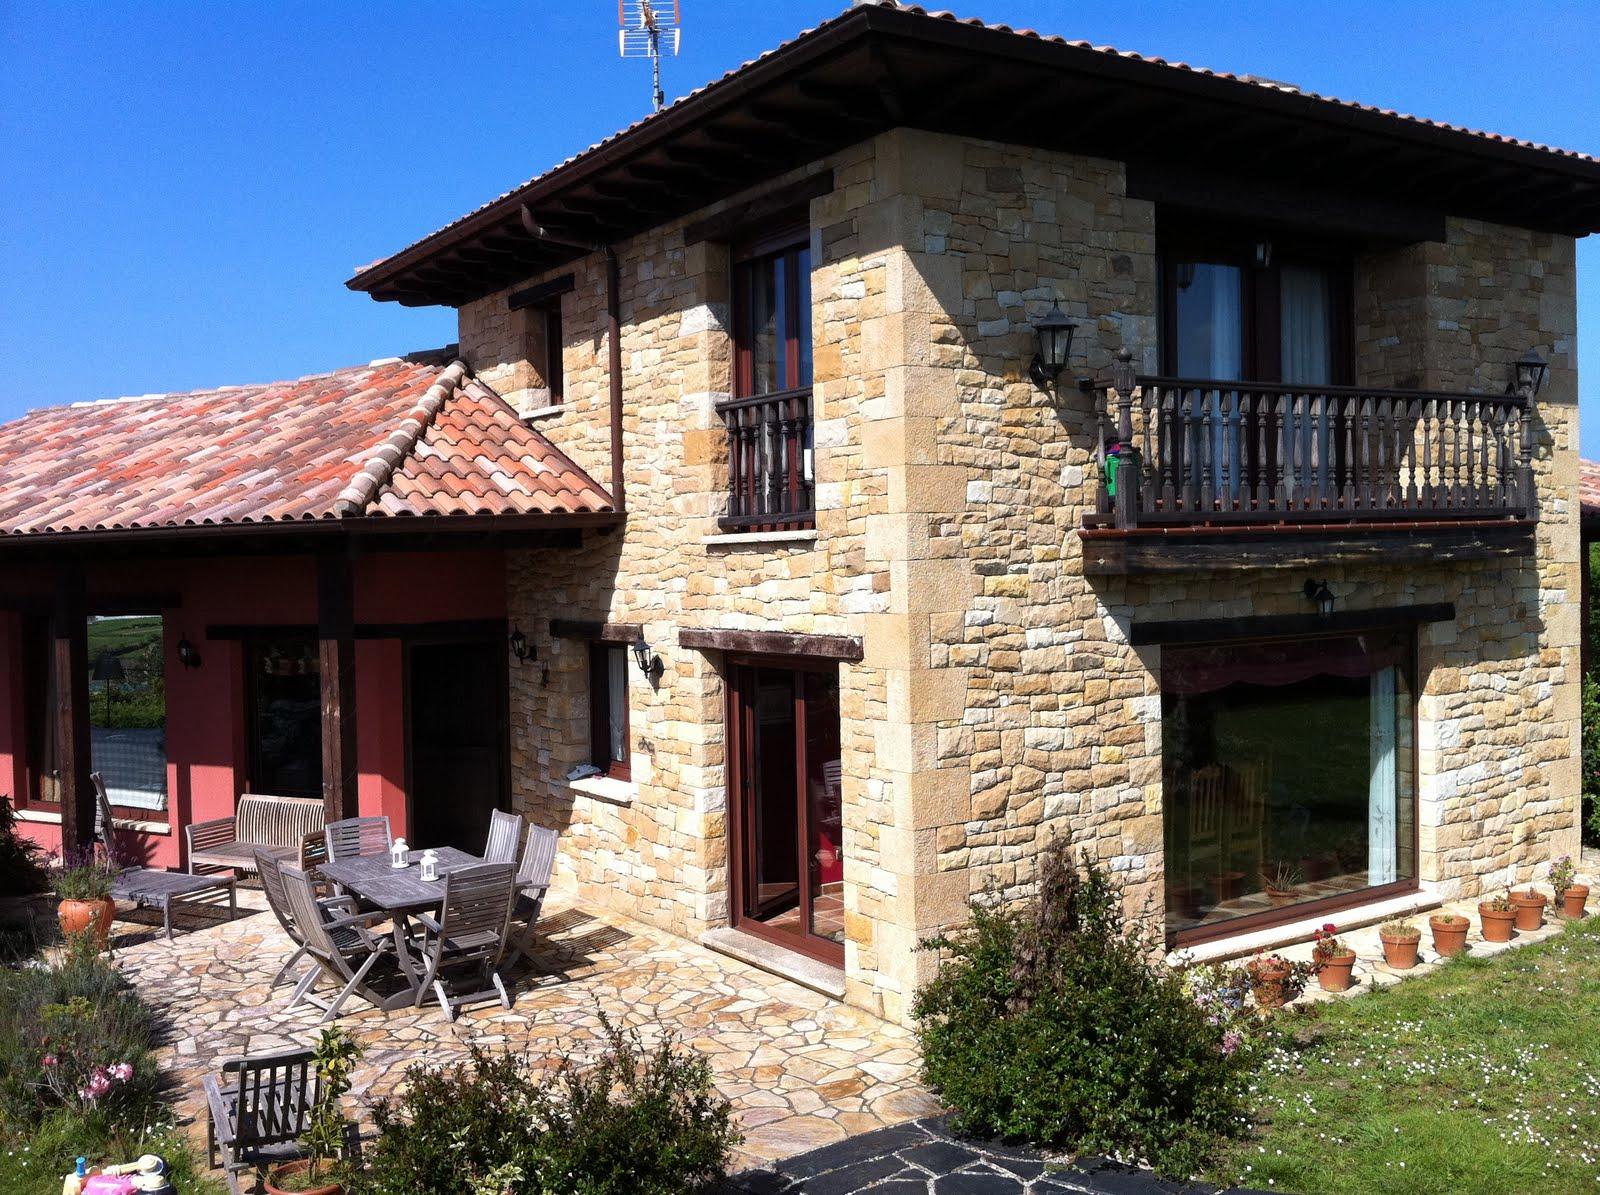 Chalet en venta o alquiler en quintueles villaviciosa - Casa tradicional asturiana ...